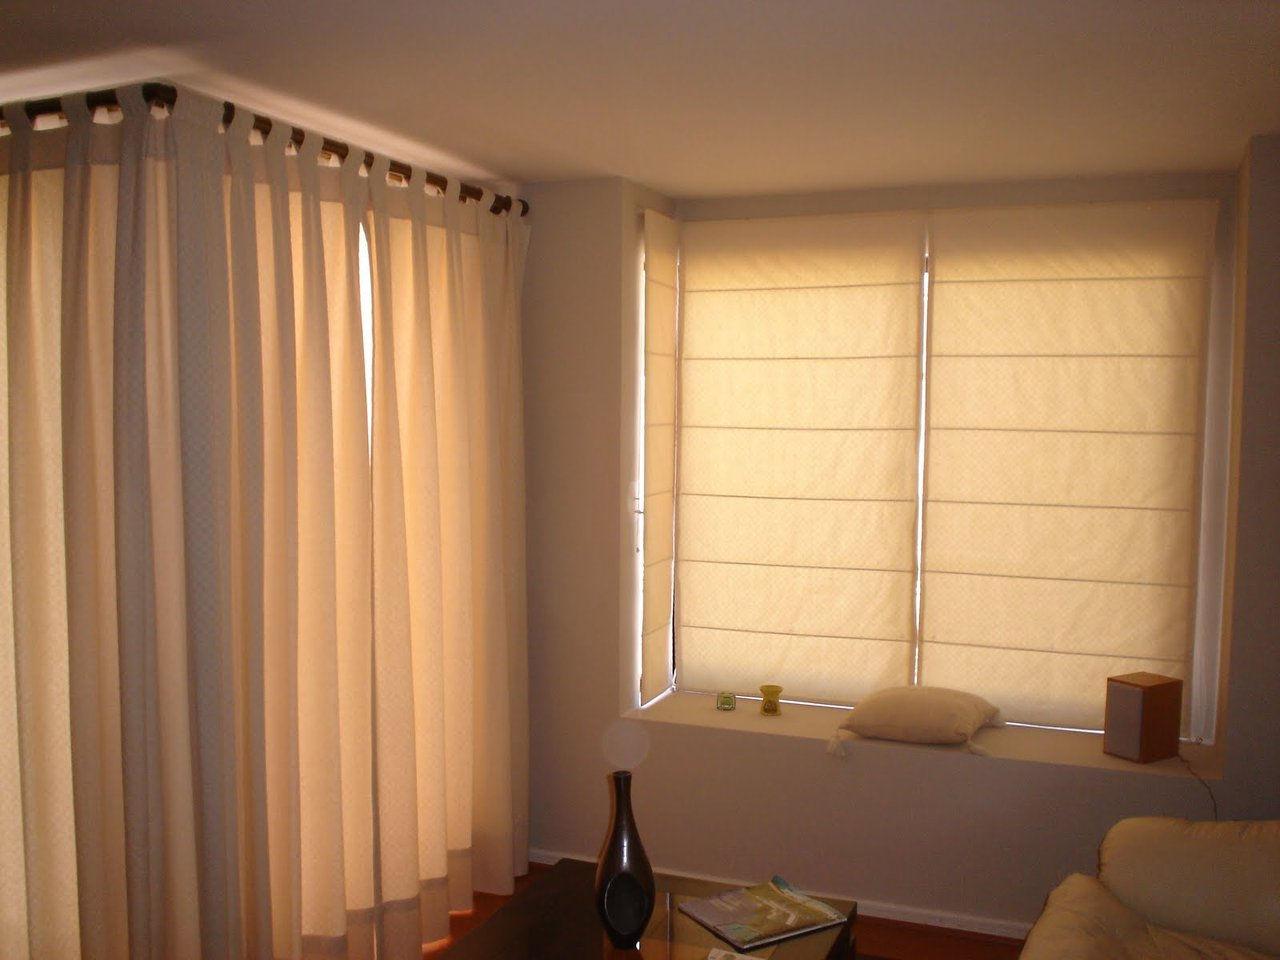 Mundo cortinas - Tipo de cortinas ...